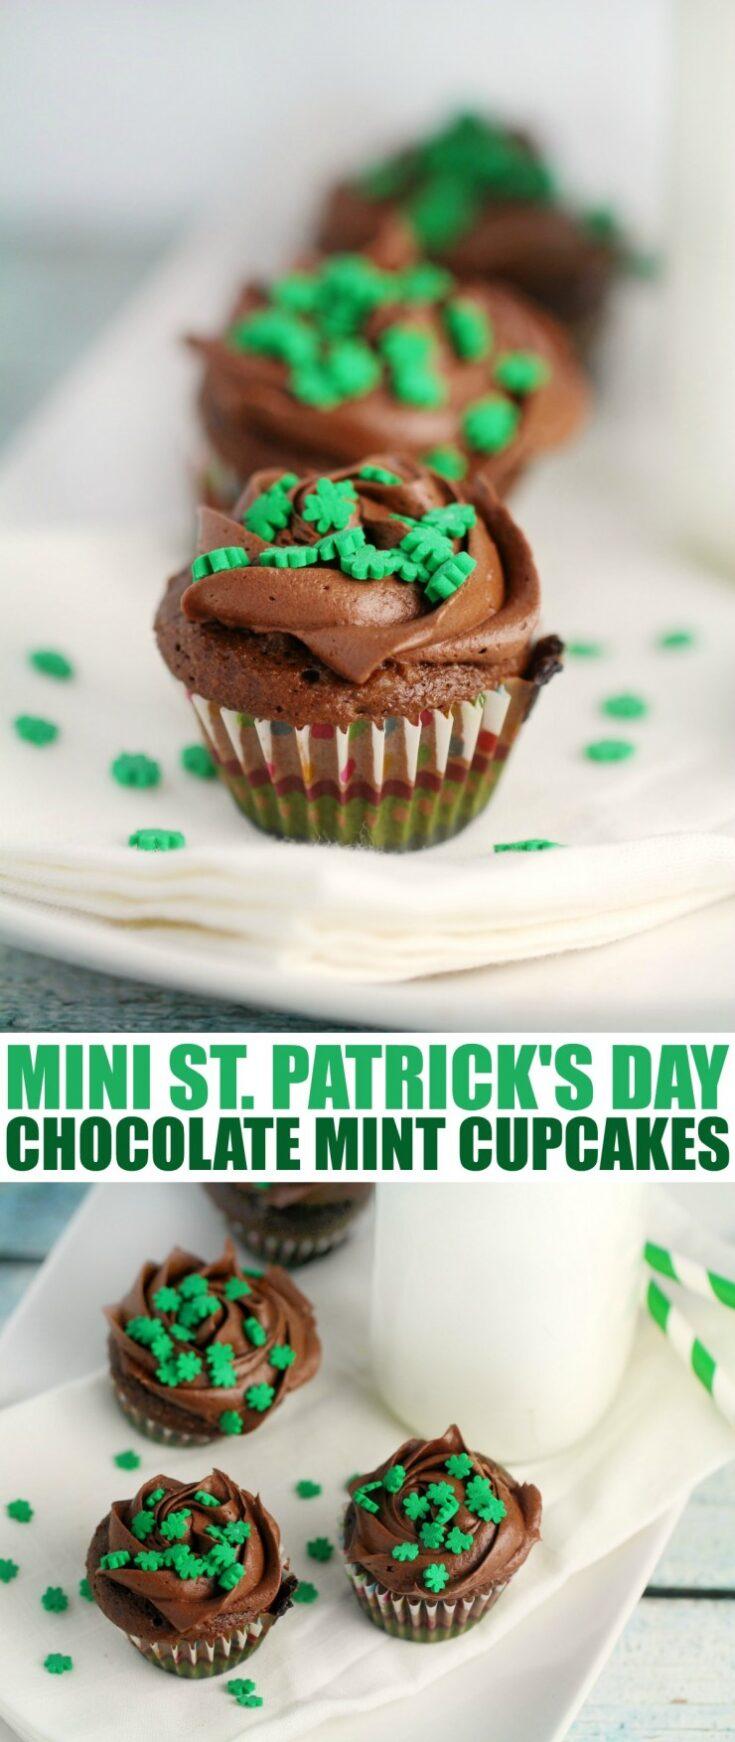 Mini St. Patrick's Day Chocolate Mint Cupcakes